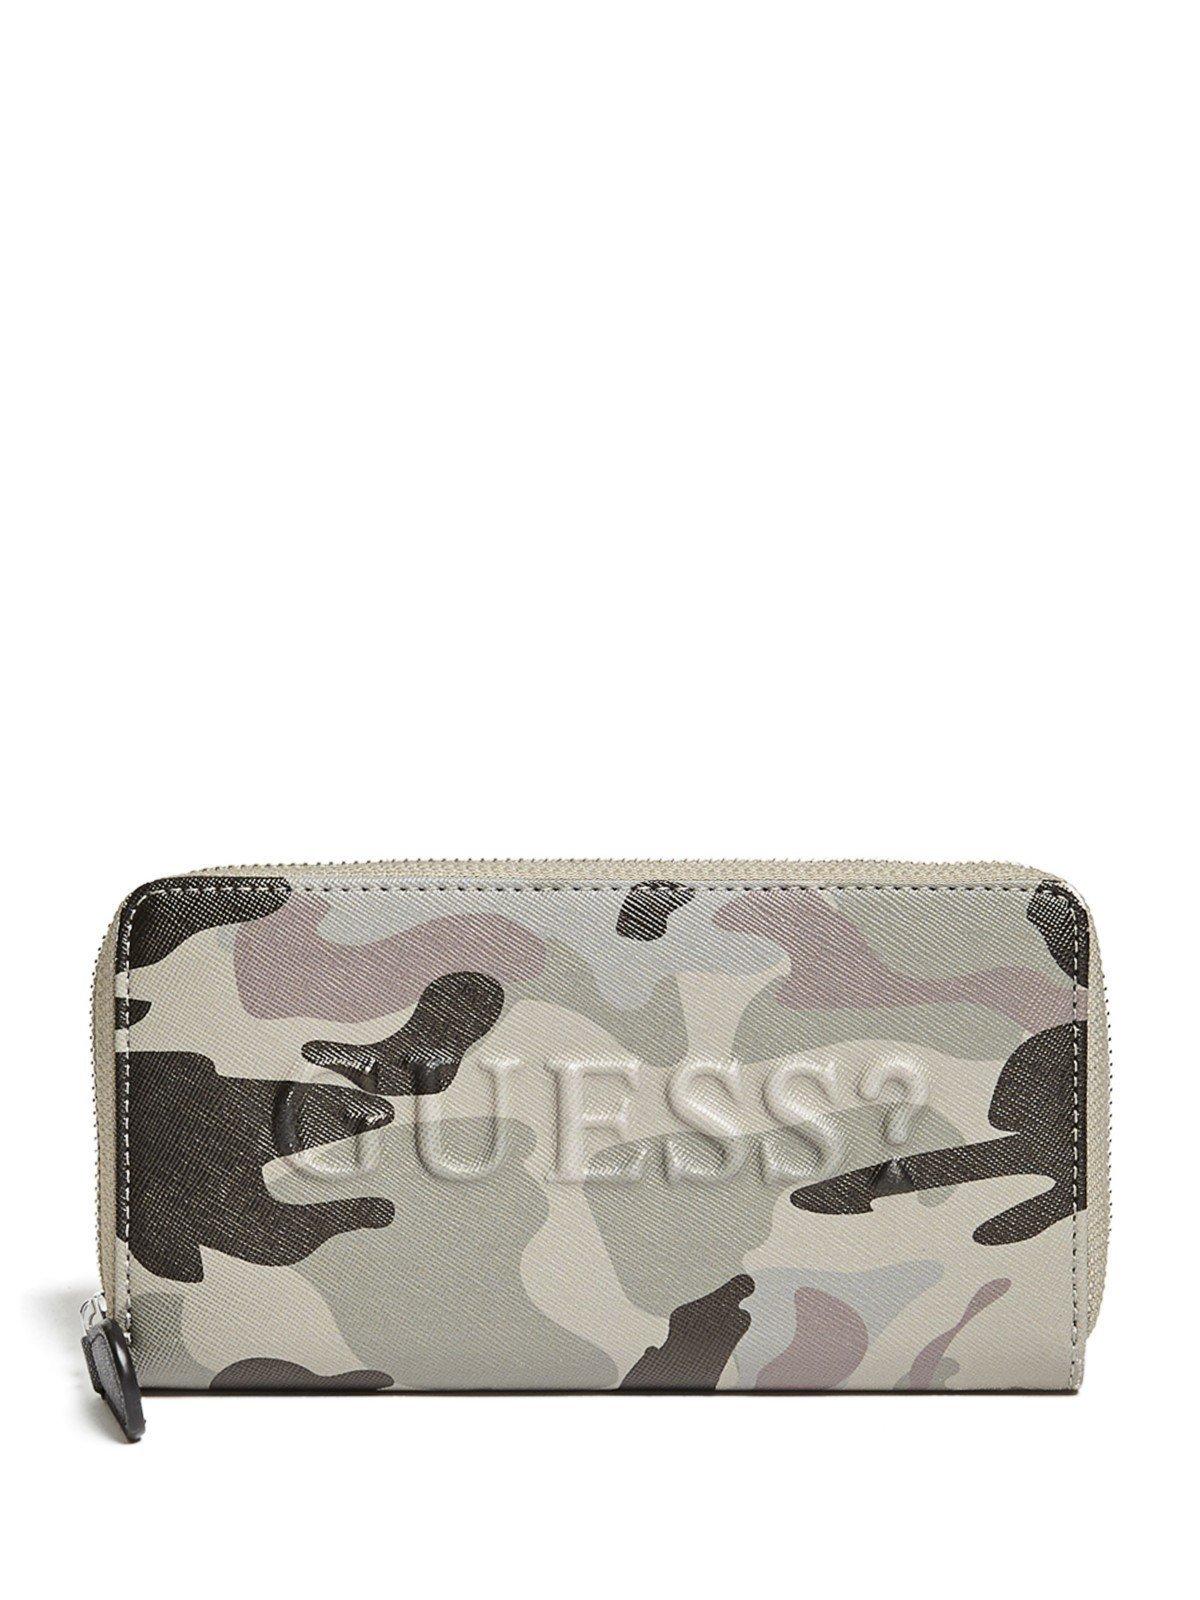 GUESS Factory Women's Rigden Camo Zip-Around Wallet